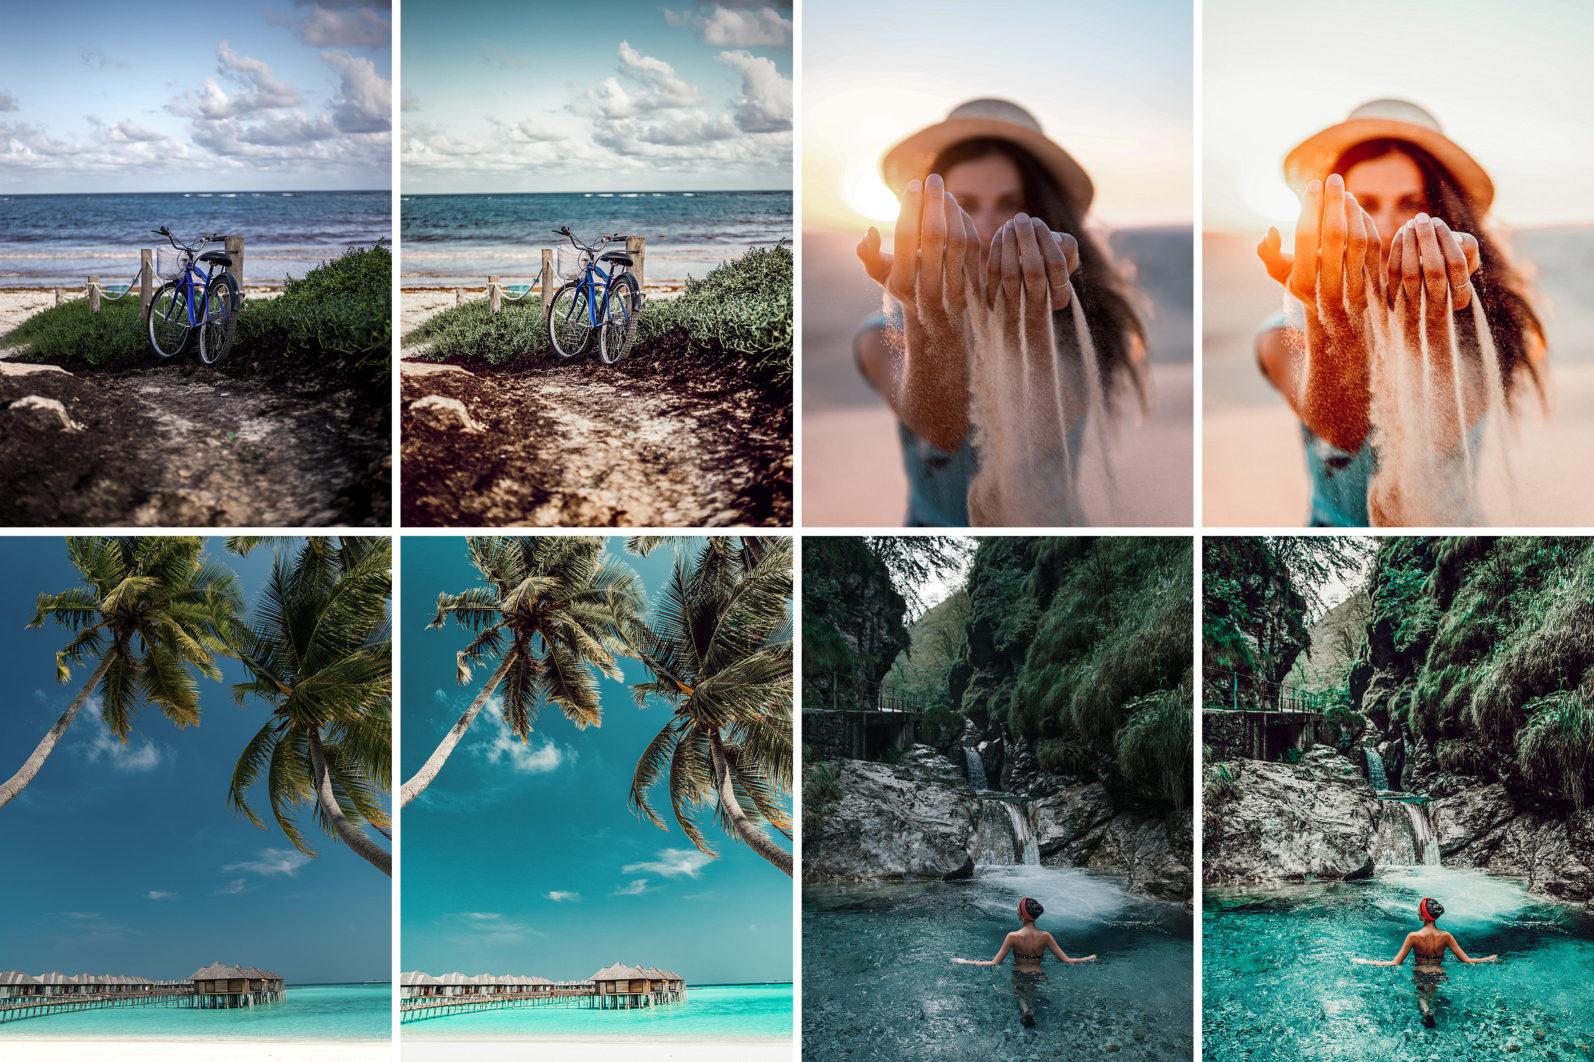 34. Summer Island - 34.SUMMERISLAND 04 -